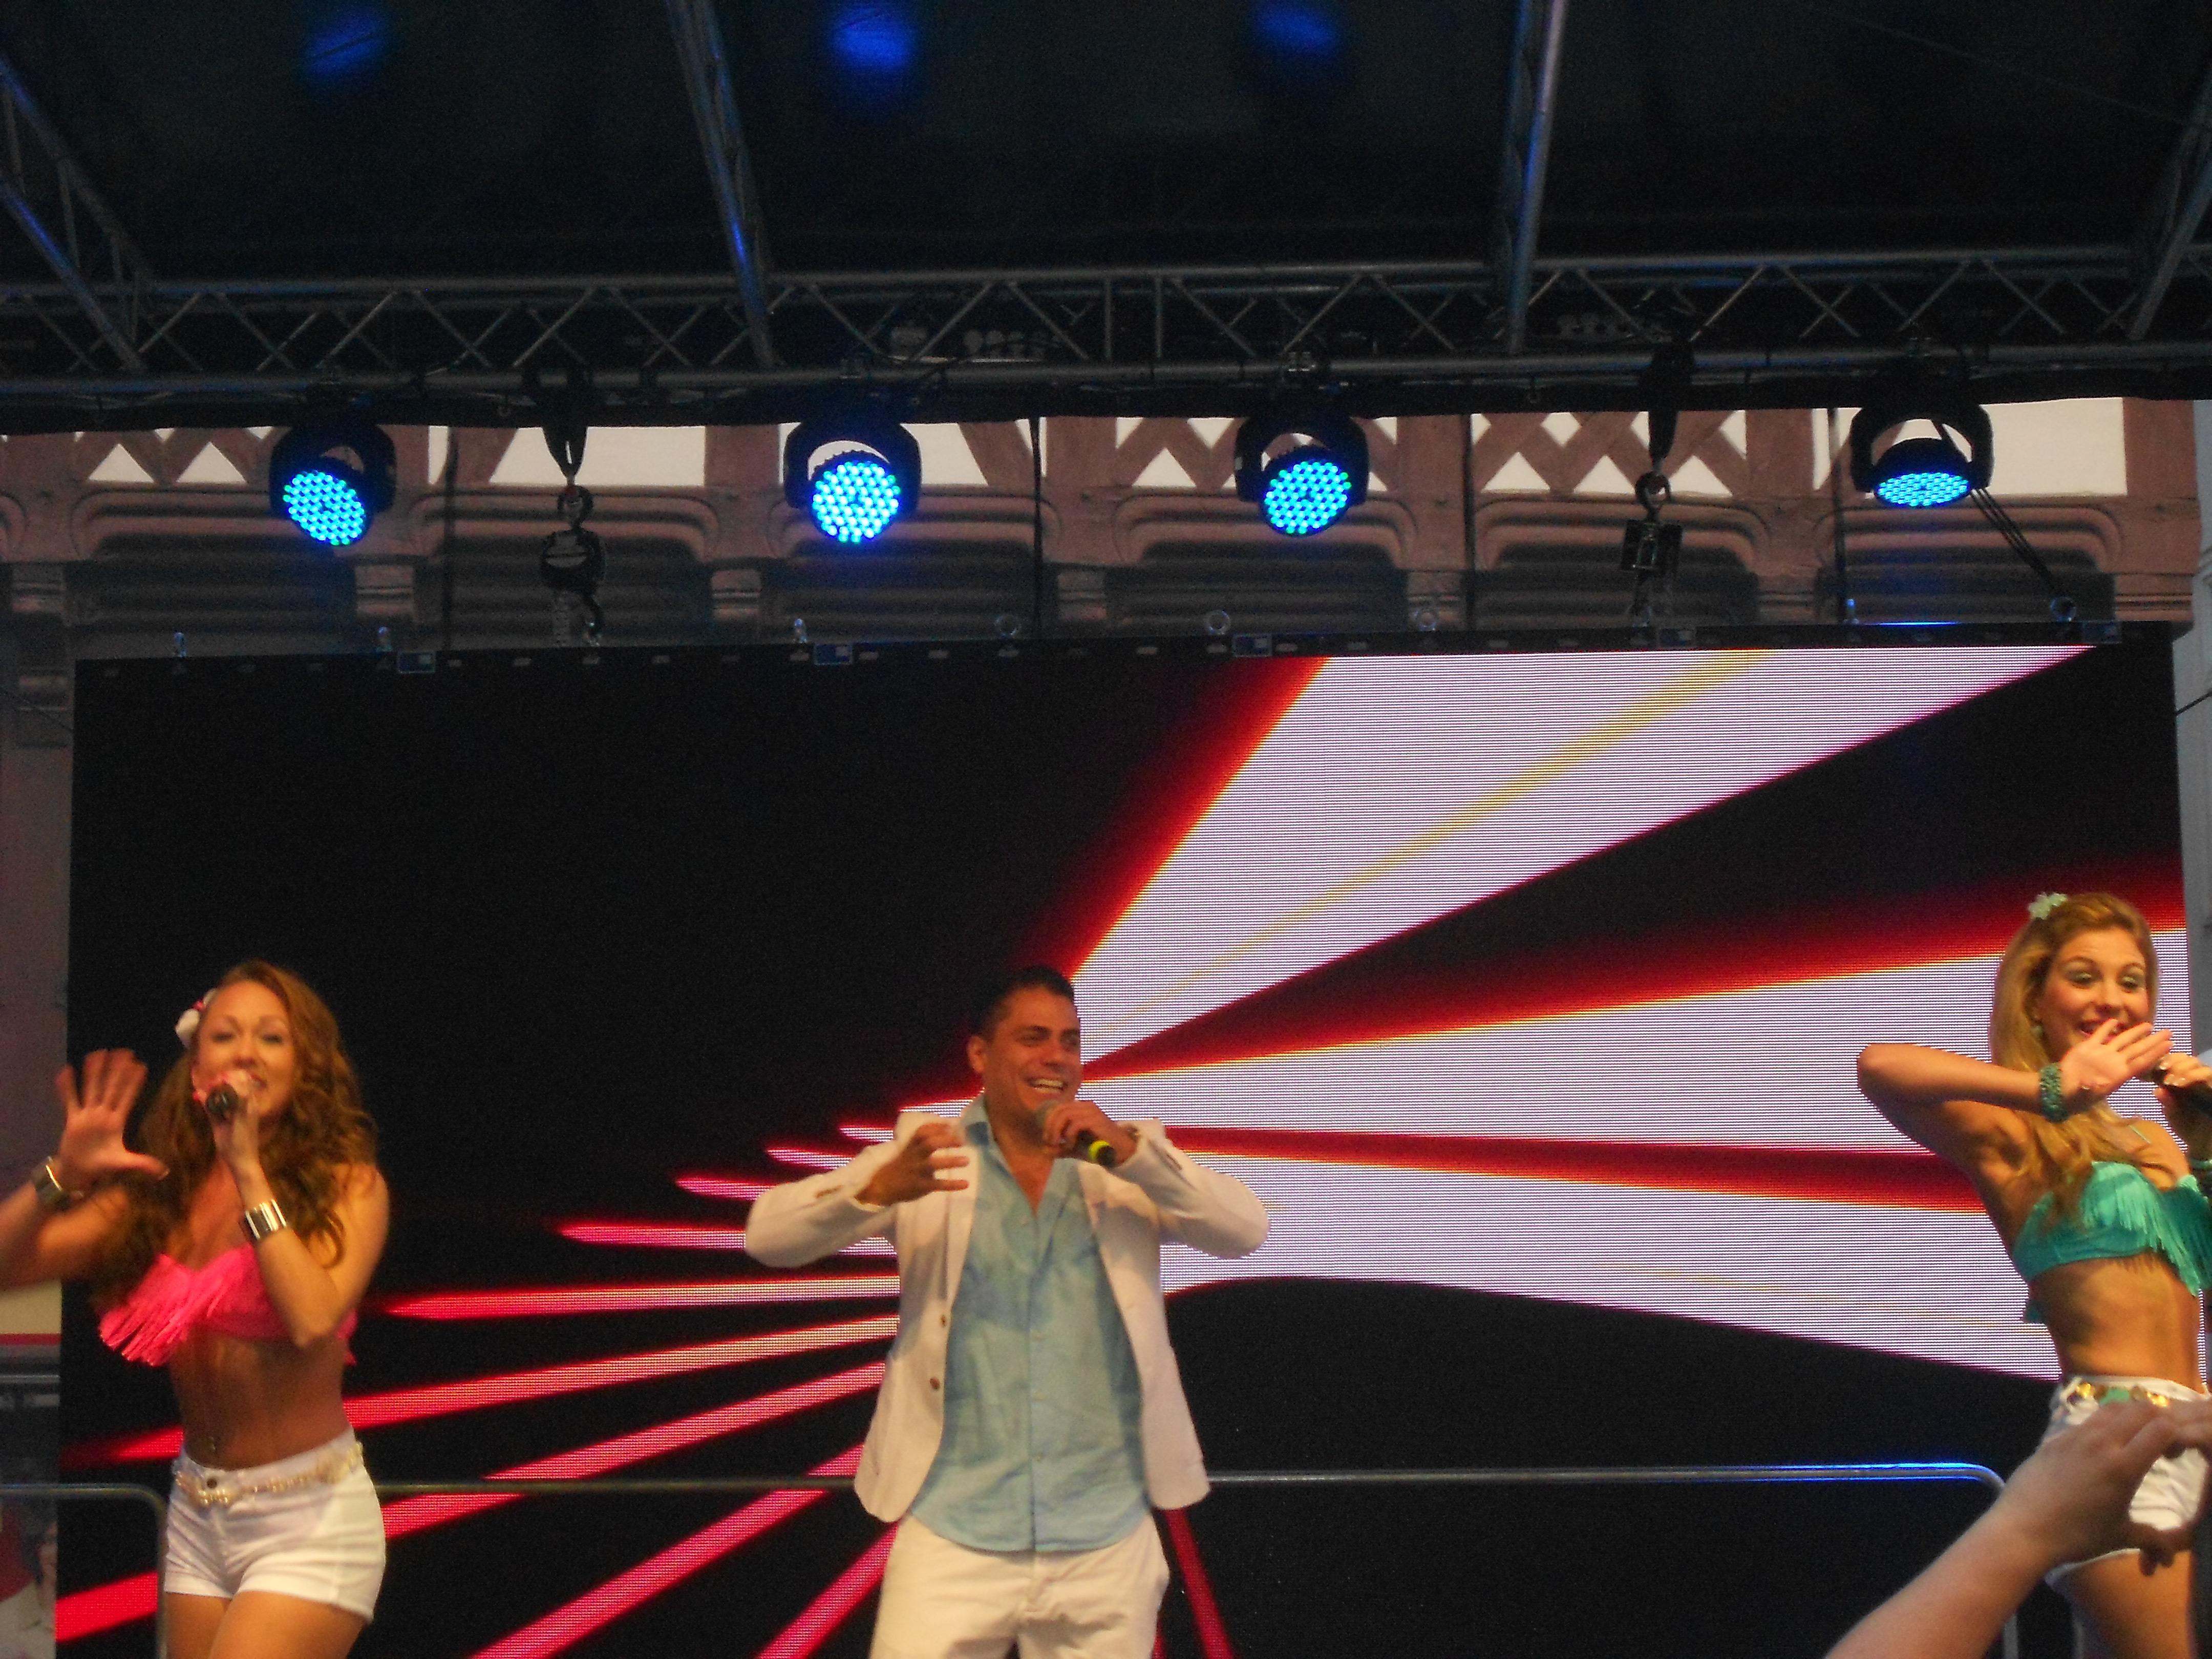 Hot_Banditoz_Ga?nseliesel-Fest.jpg